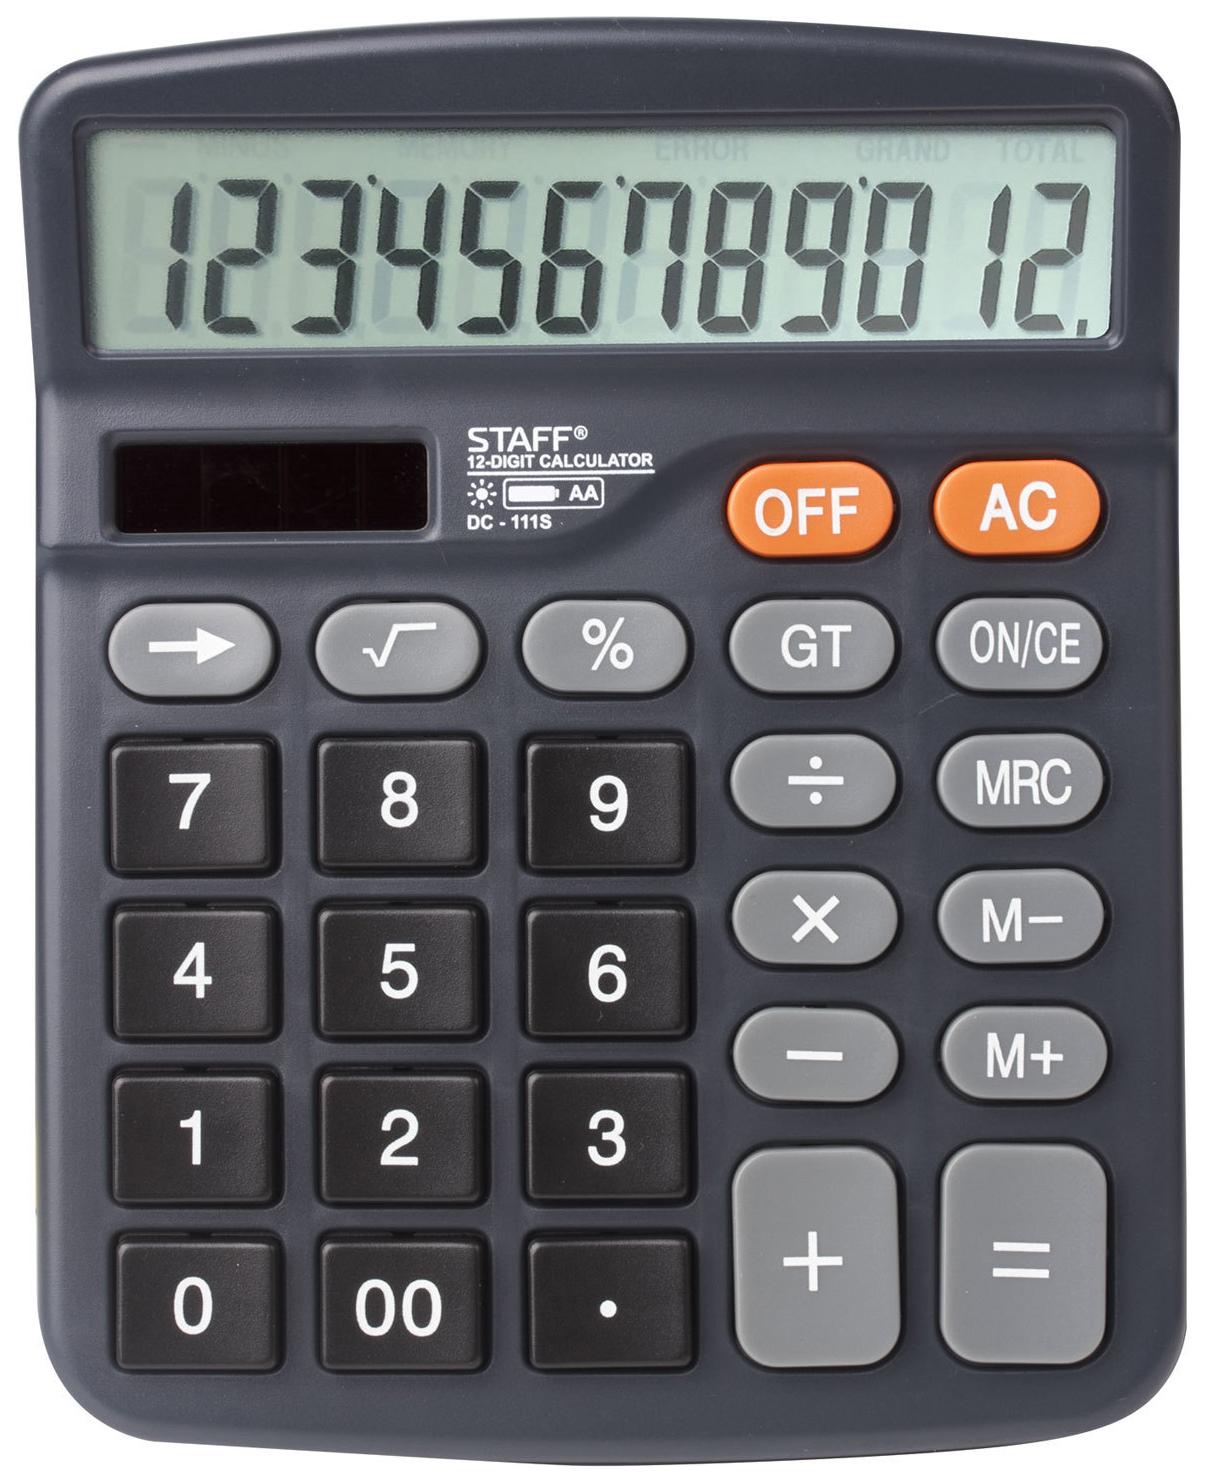 Калькулятор Staff PLUS настольный DC-111S, батарейка АА, 12 разрядов, 150x120 мм